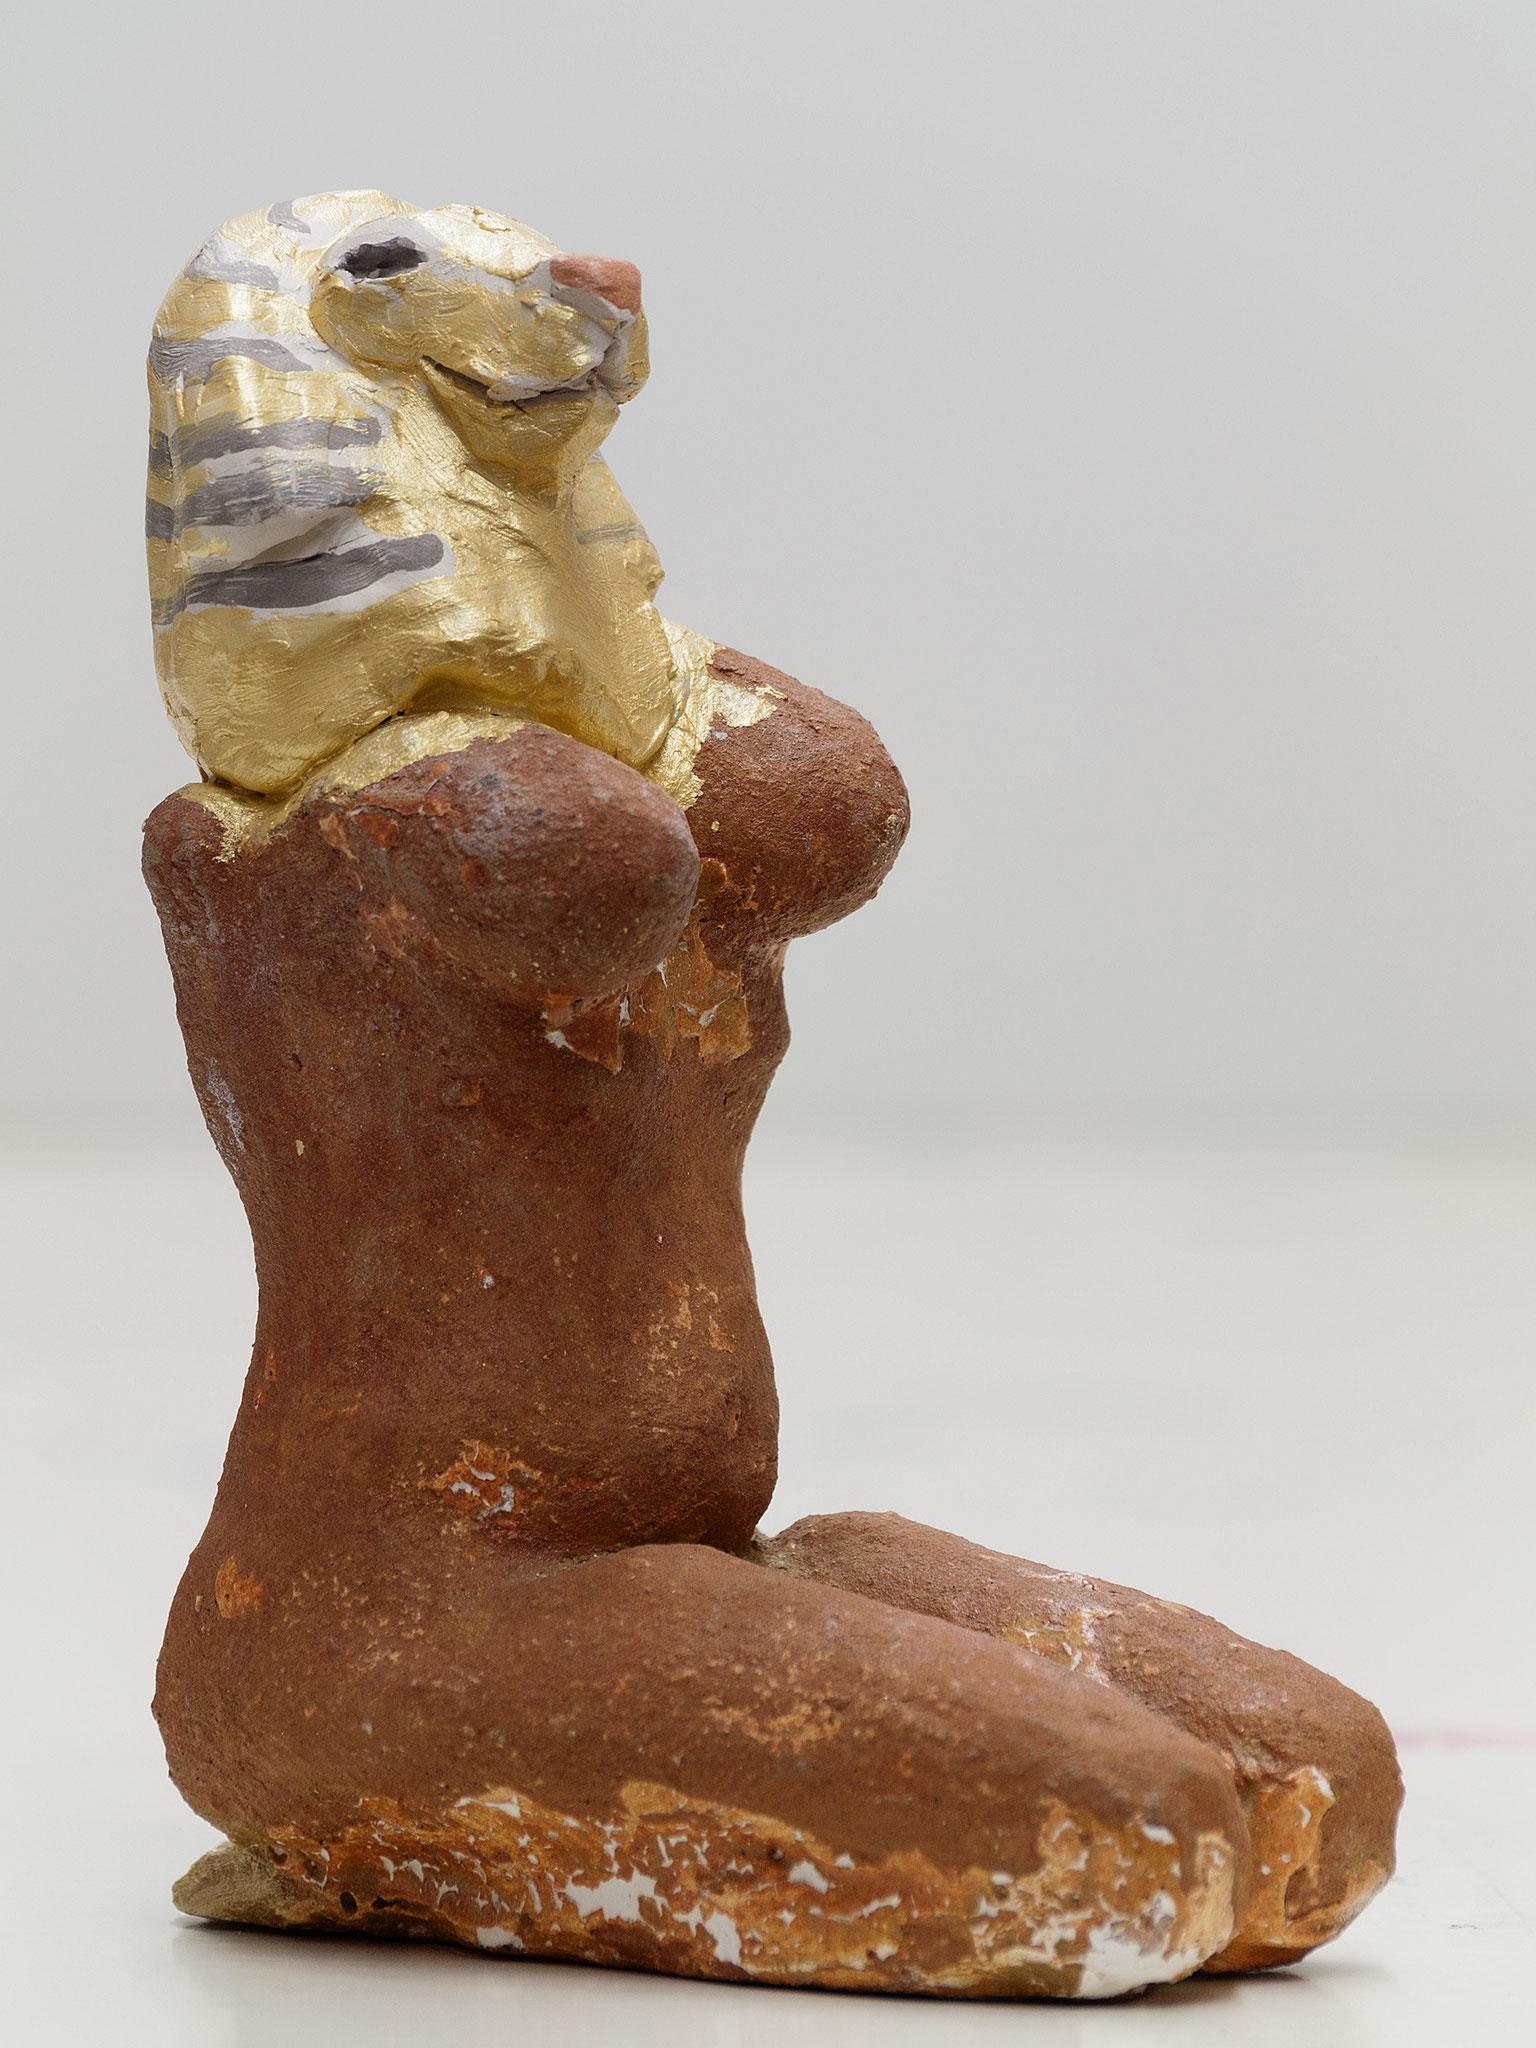 Serie Animagae, Katzenfrau, Tonplastik ca. 18 cm, 2014